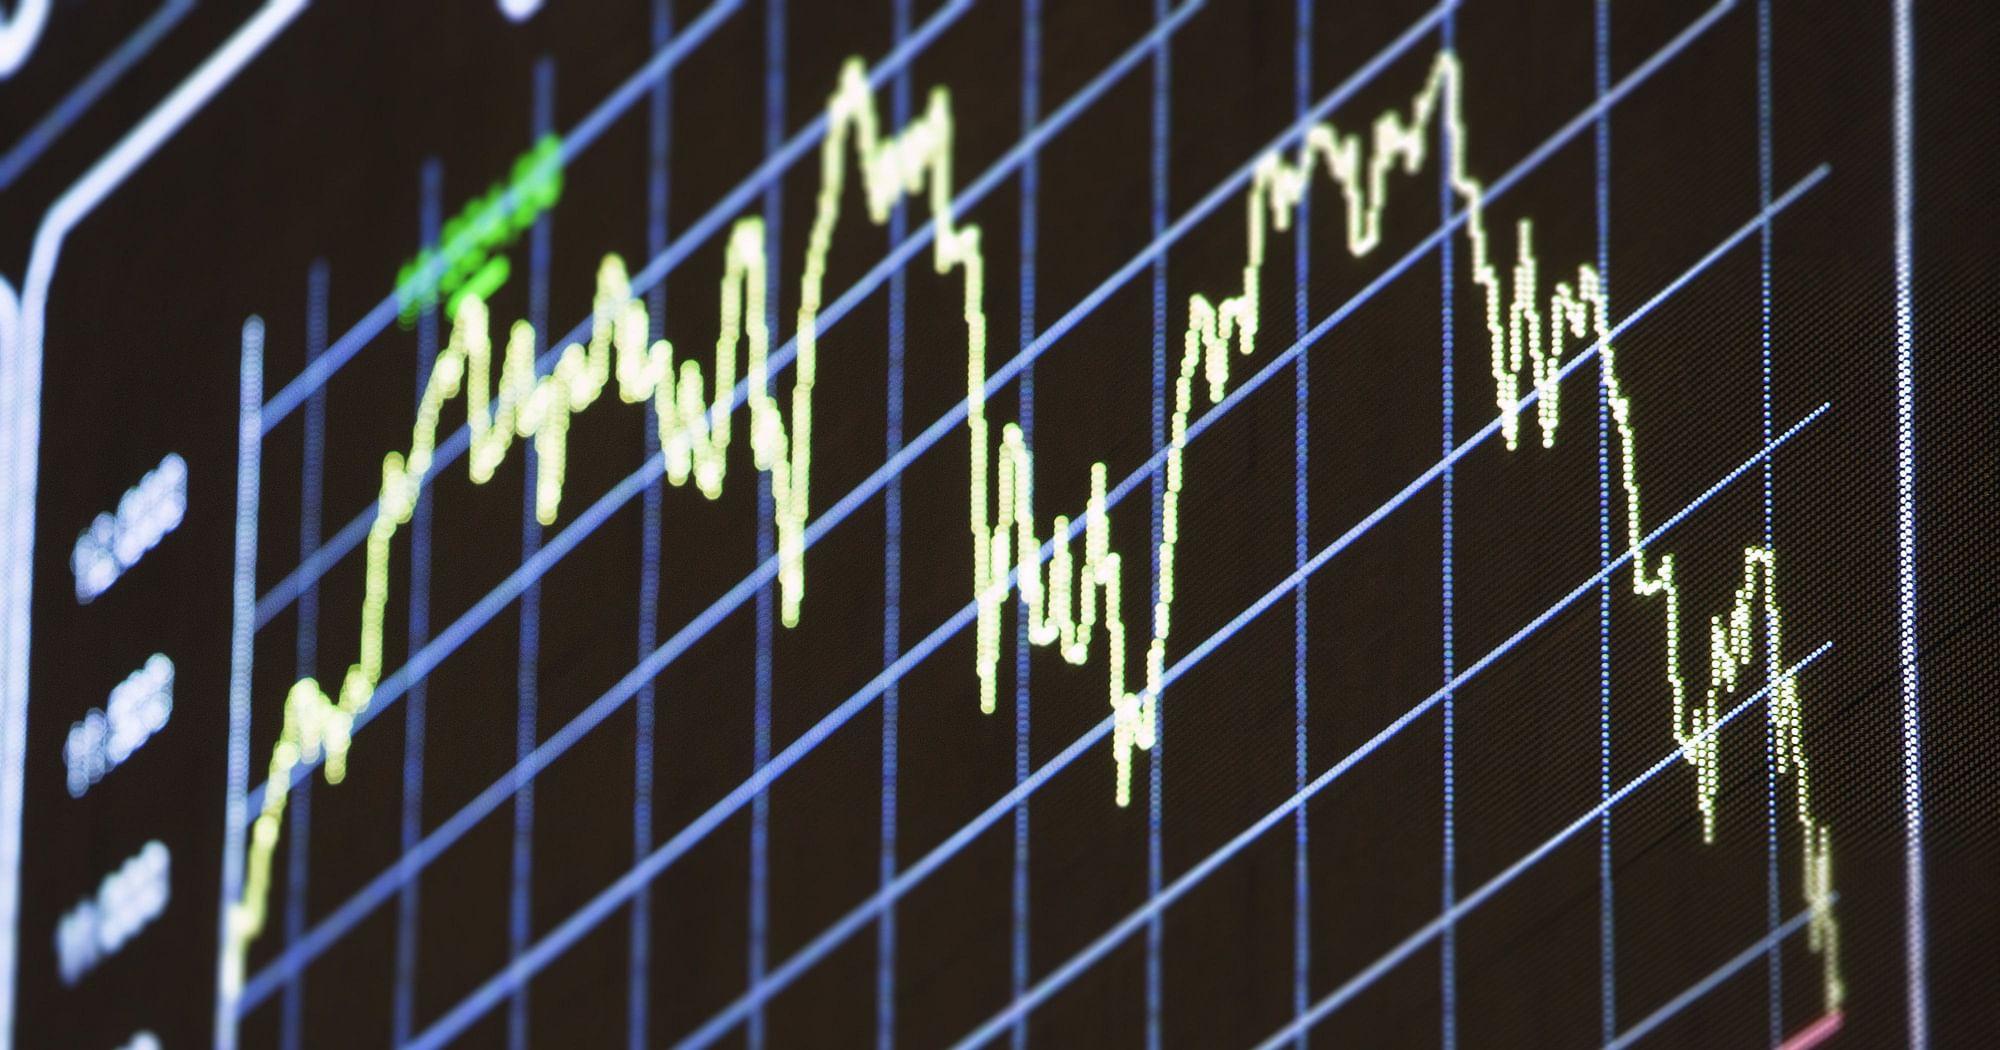 SGX Nifty Indicates Gains; RIL, Hindalco, Zuari Agro In Focus